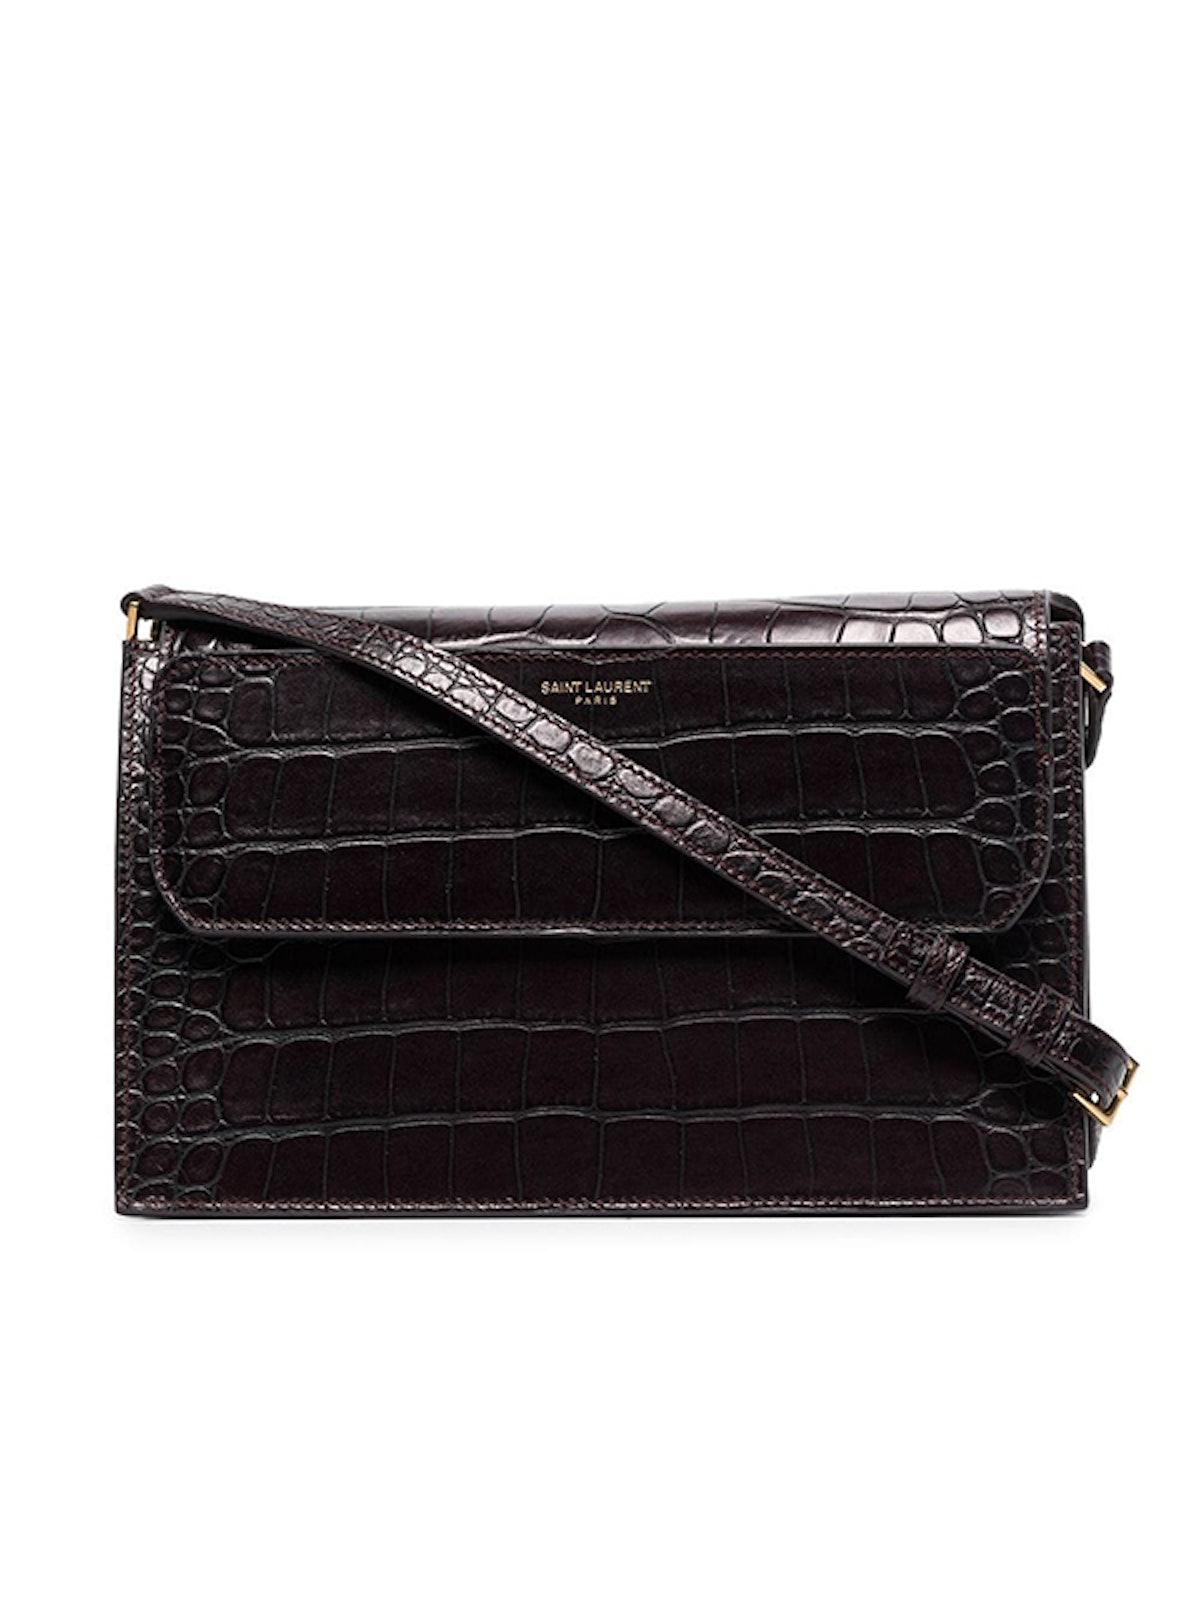 Catherine Crocodile-Effect Leather Shoulder Bag